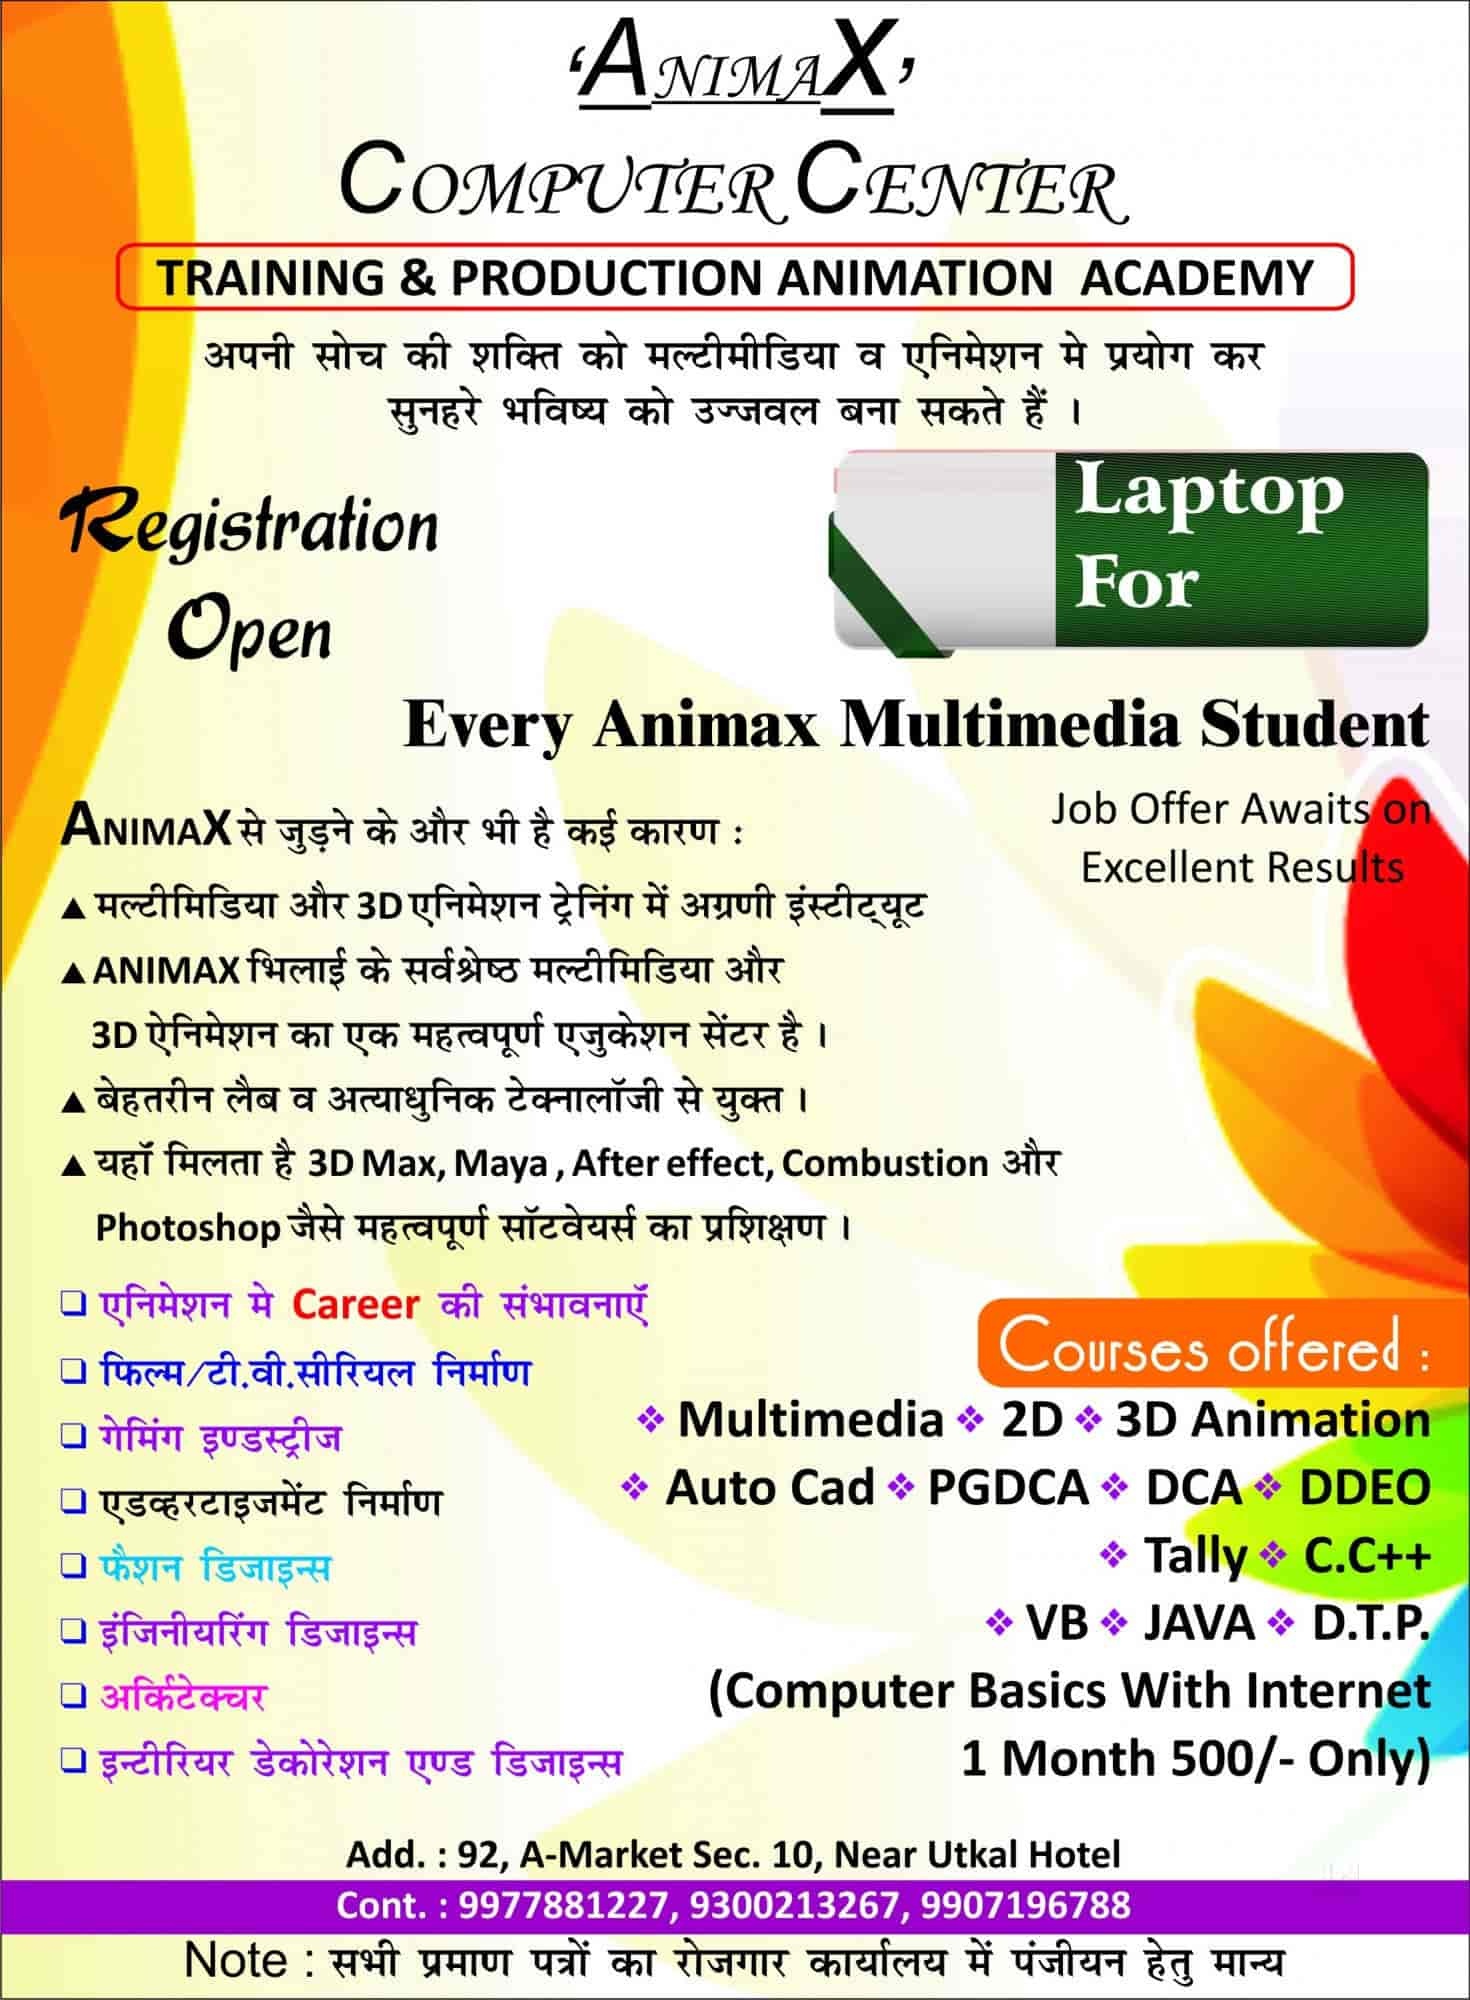 Animax Computer Centre, Bhilai Sector 10 - Computer Training